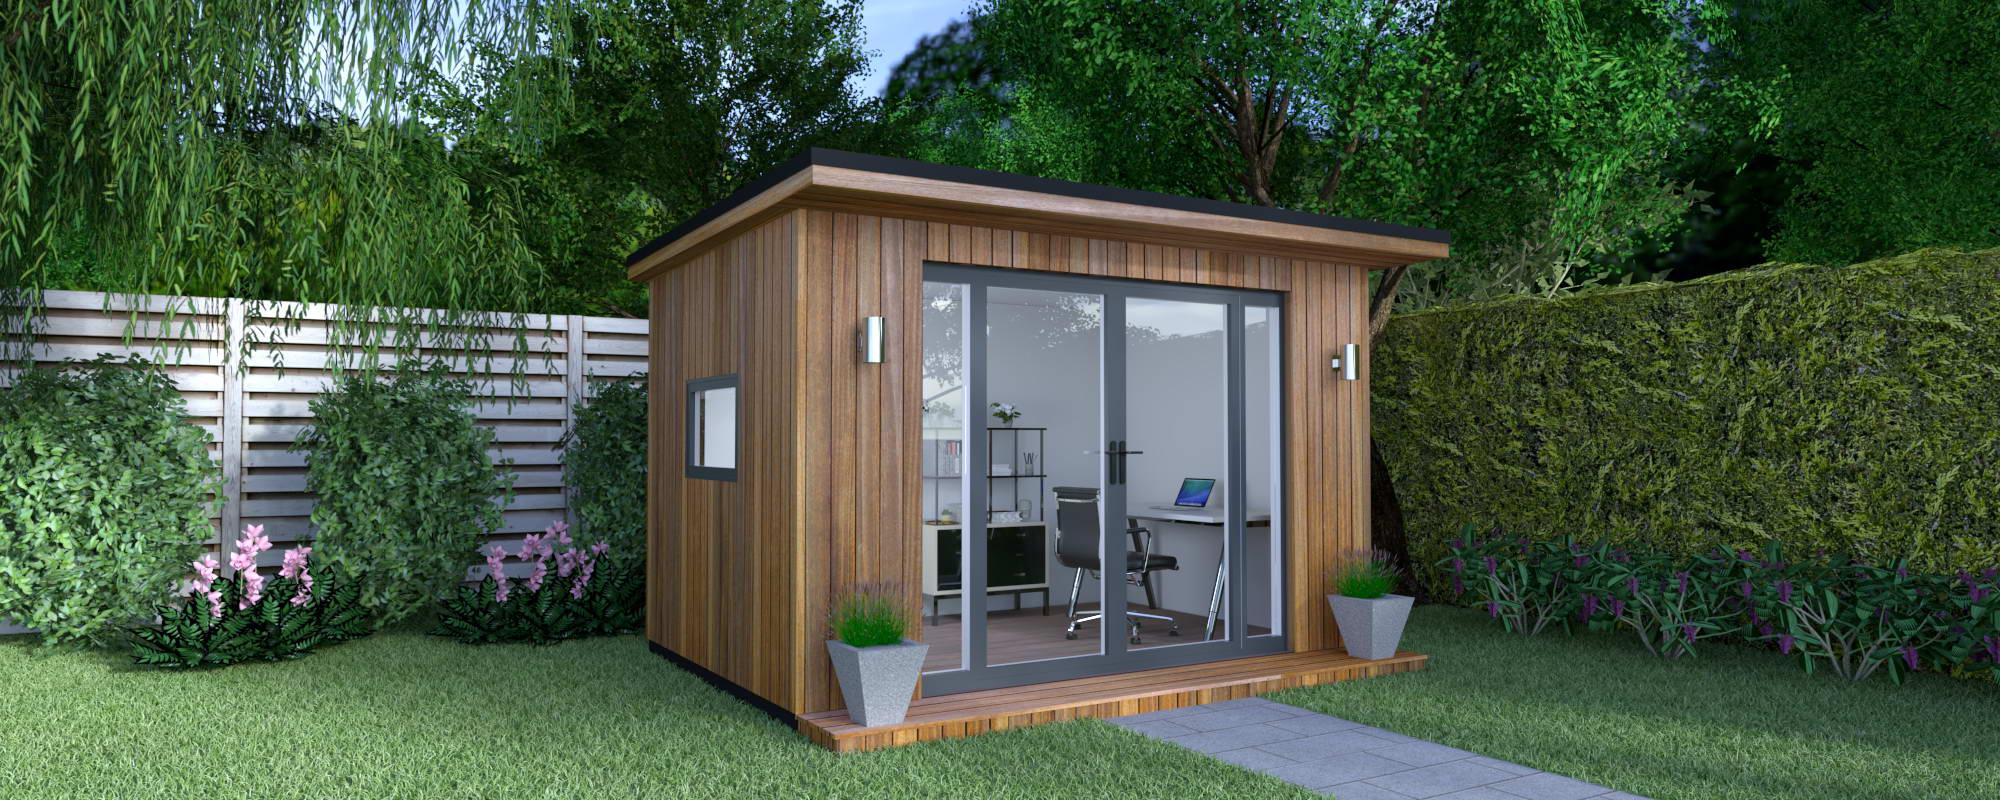 classic garden office